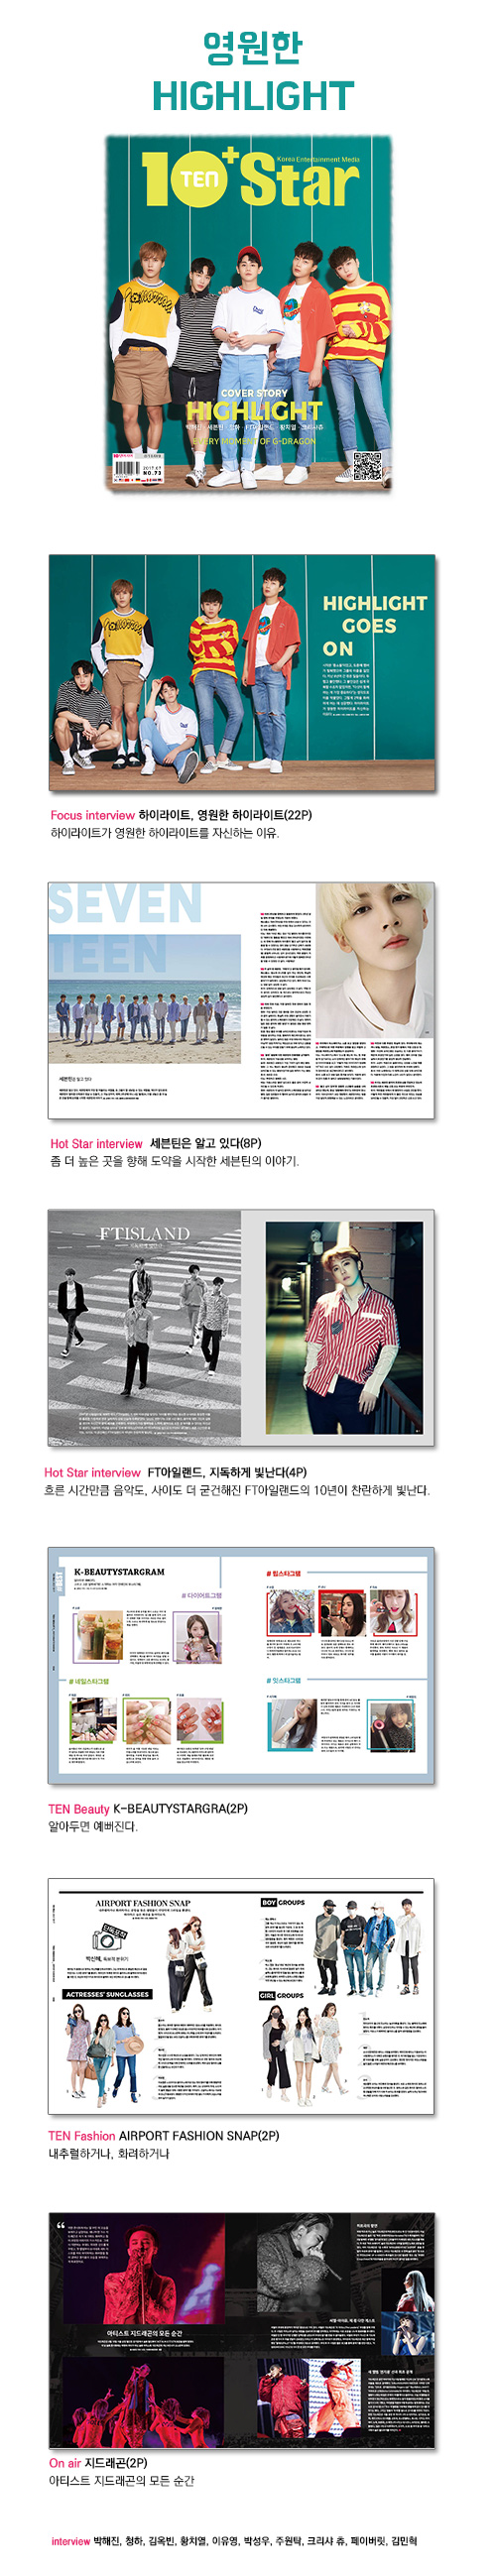 韓国芸能雑誌 10asia 10 + Star 2017年7月号 HIGHLIGHT表紙、SEVENTEEN、FTISLAND、G-DRAGON掲載